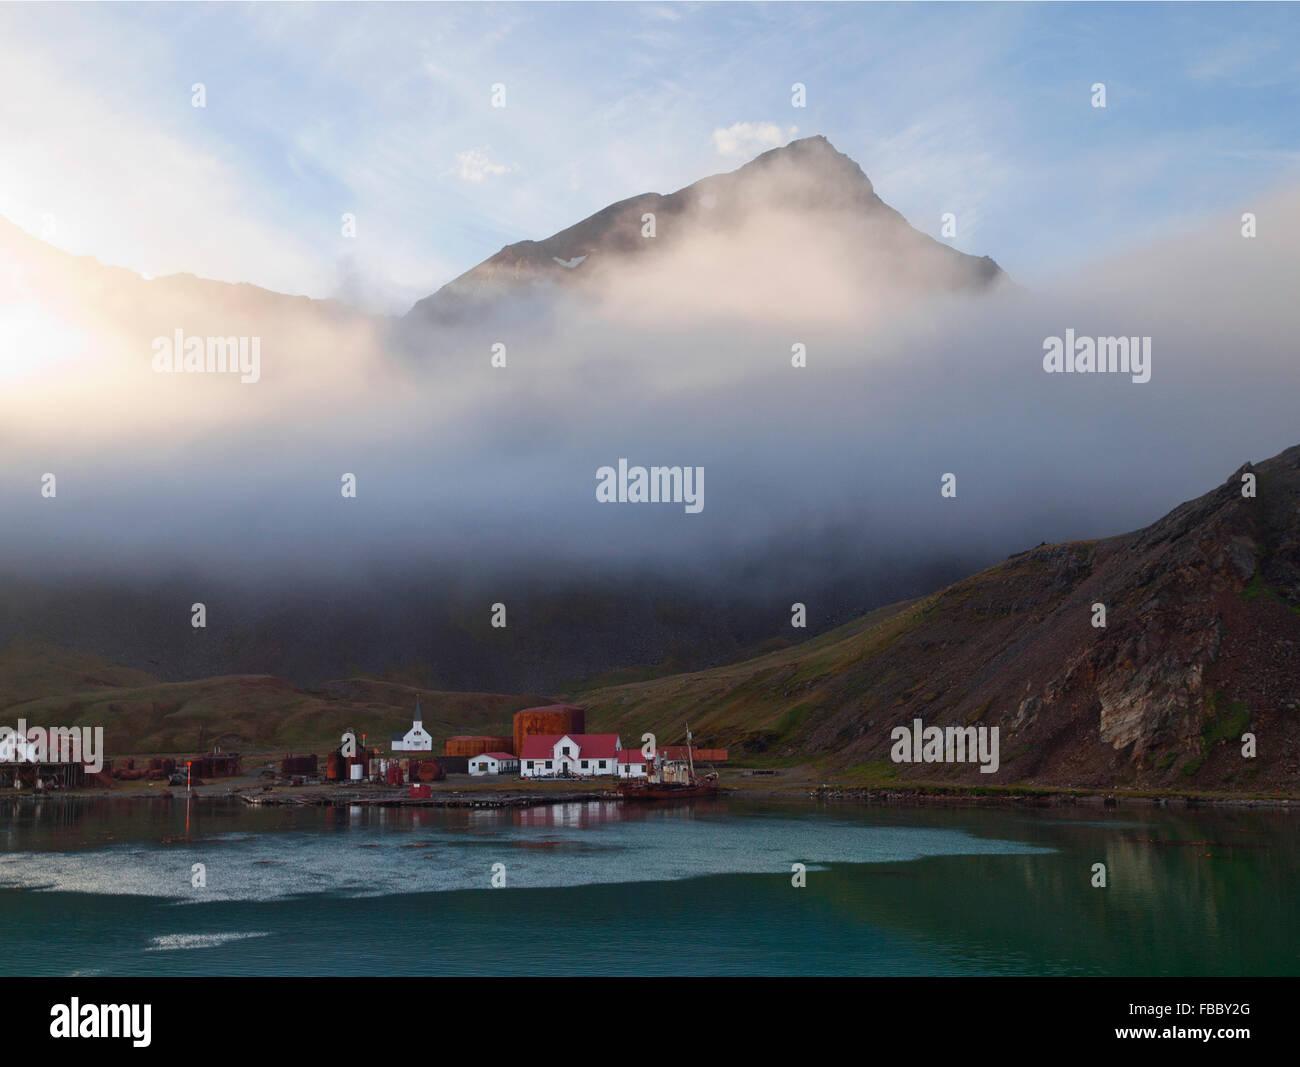 Grytviken, South Georgia - Stock Image